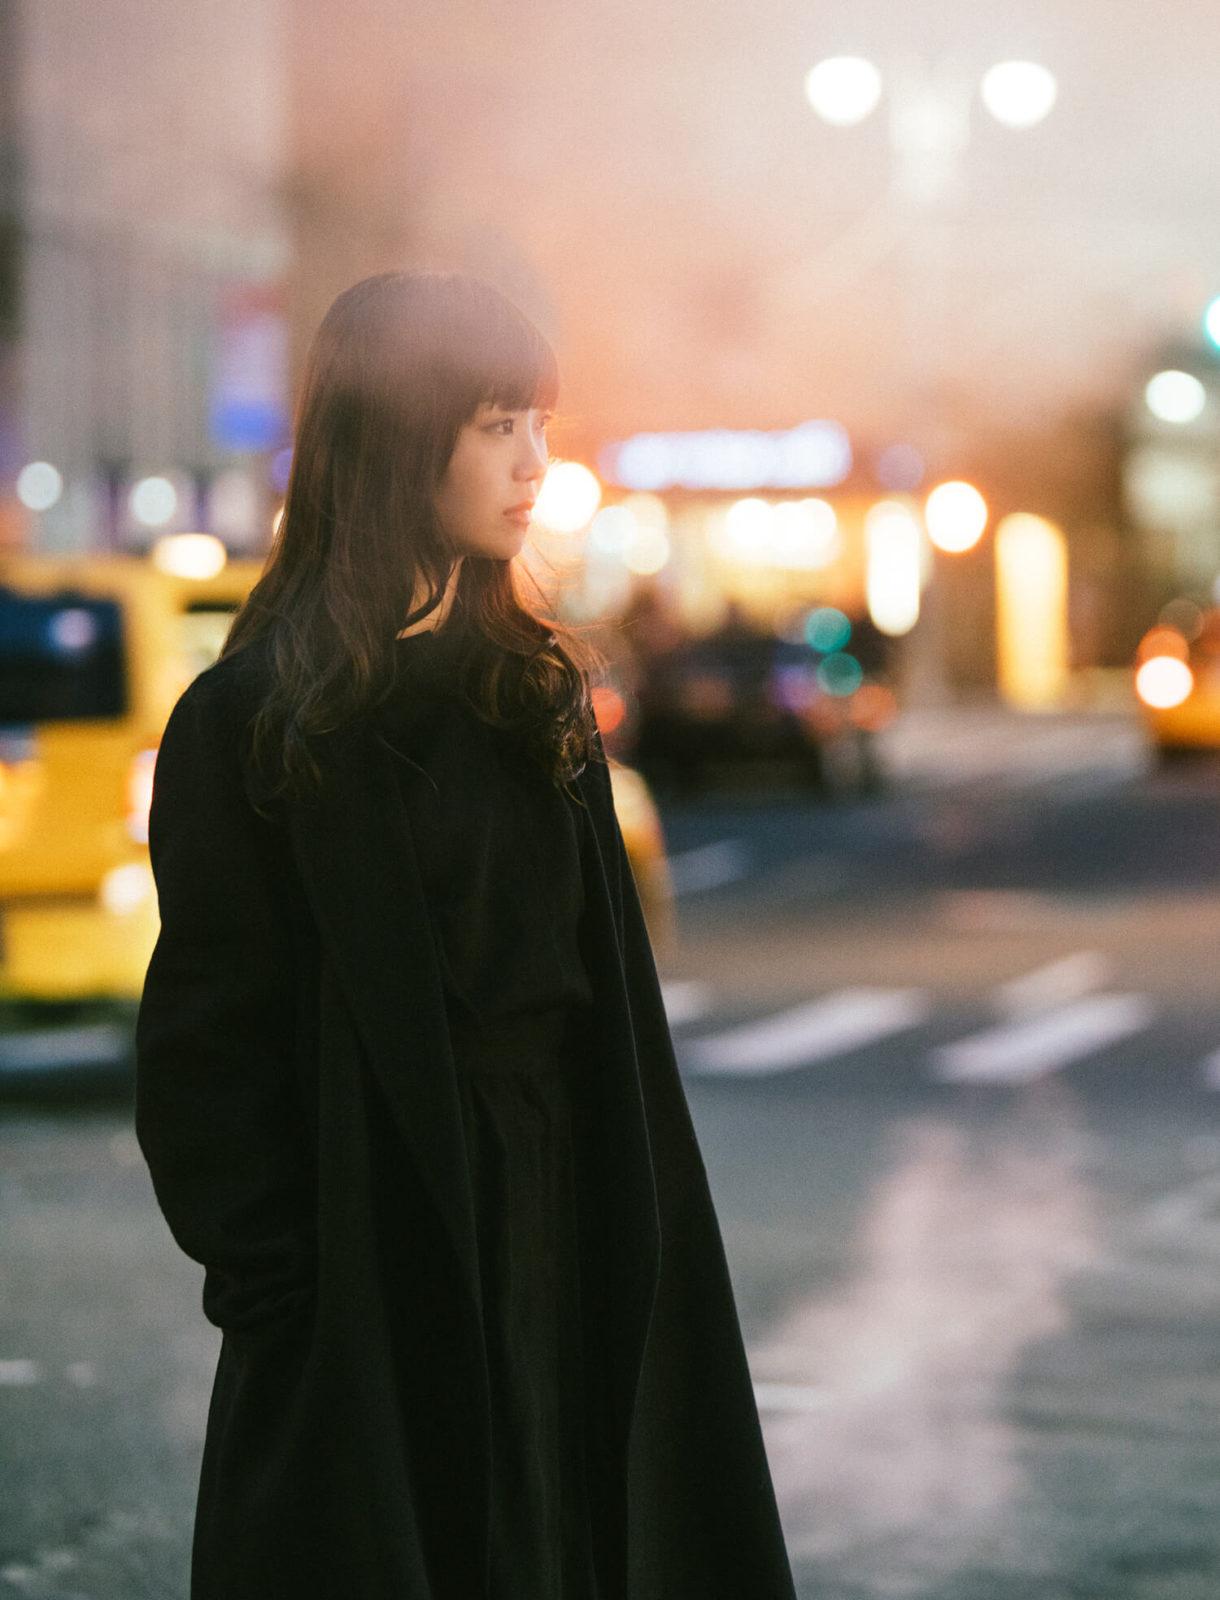 Aimer 通算17枚目のシングルリリース&TVアニメ「ヴィンランド・サガ」EDテーマ決定